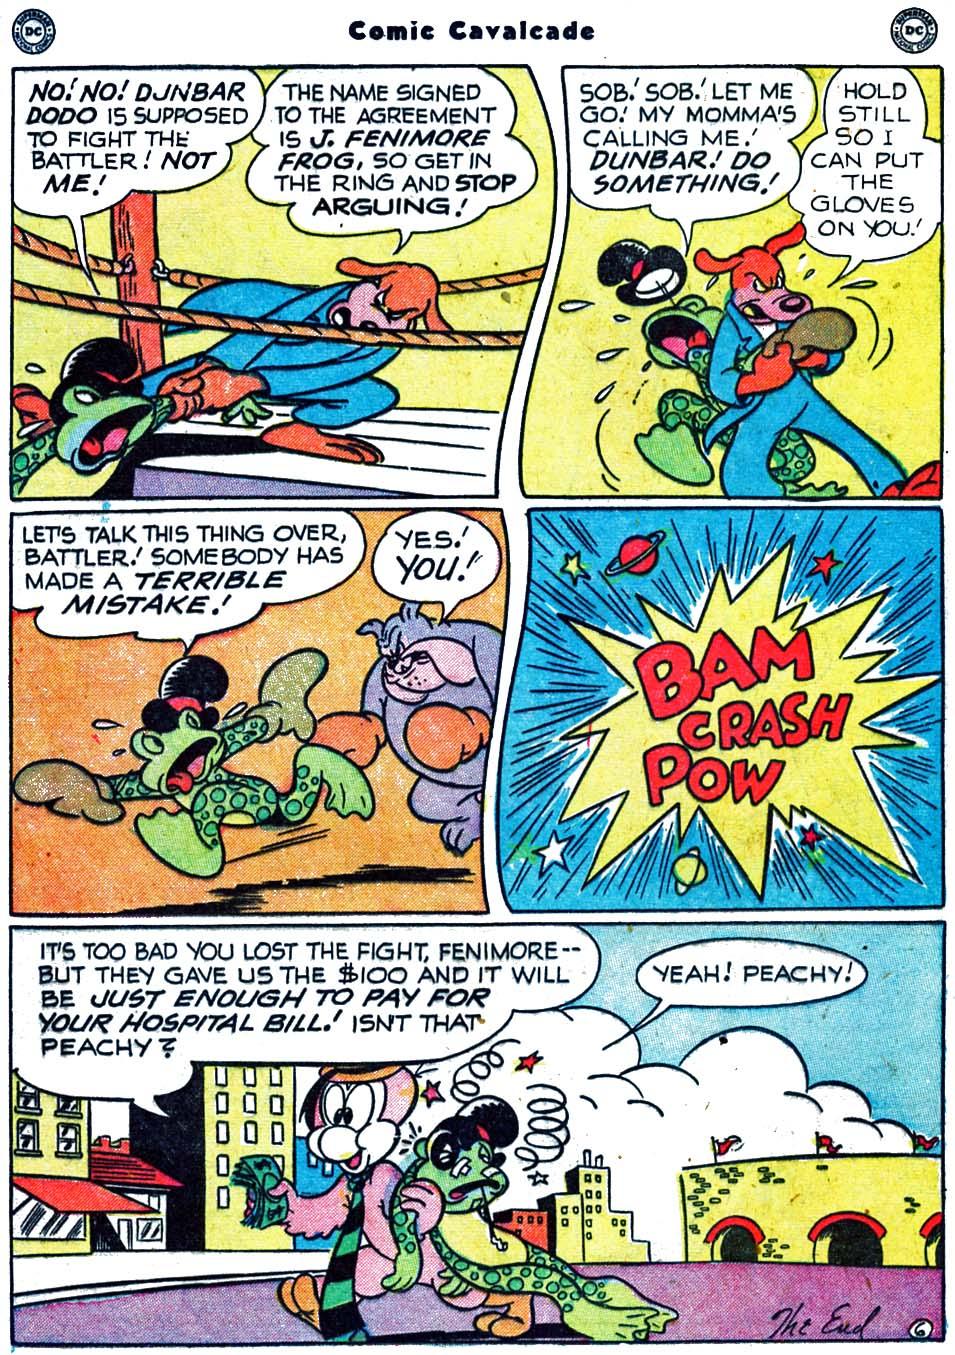 Comic Cavalcade issue 40 - Page 37